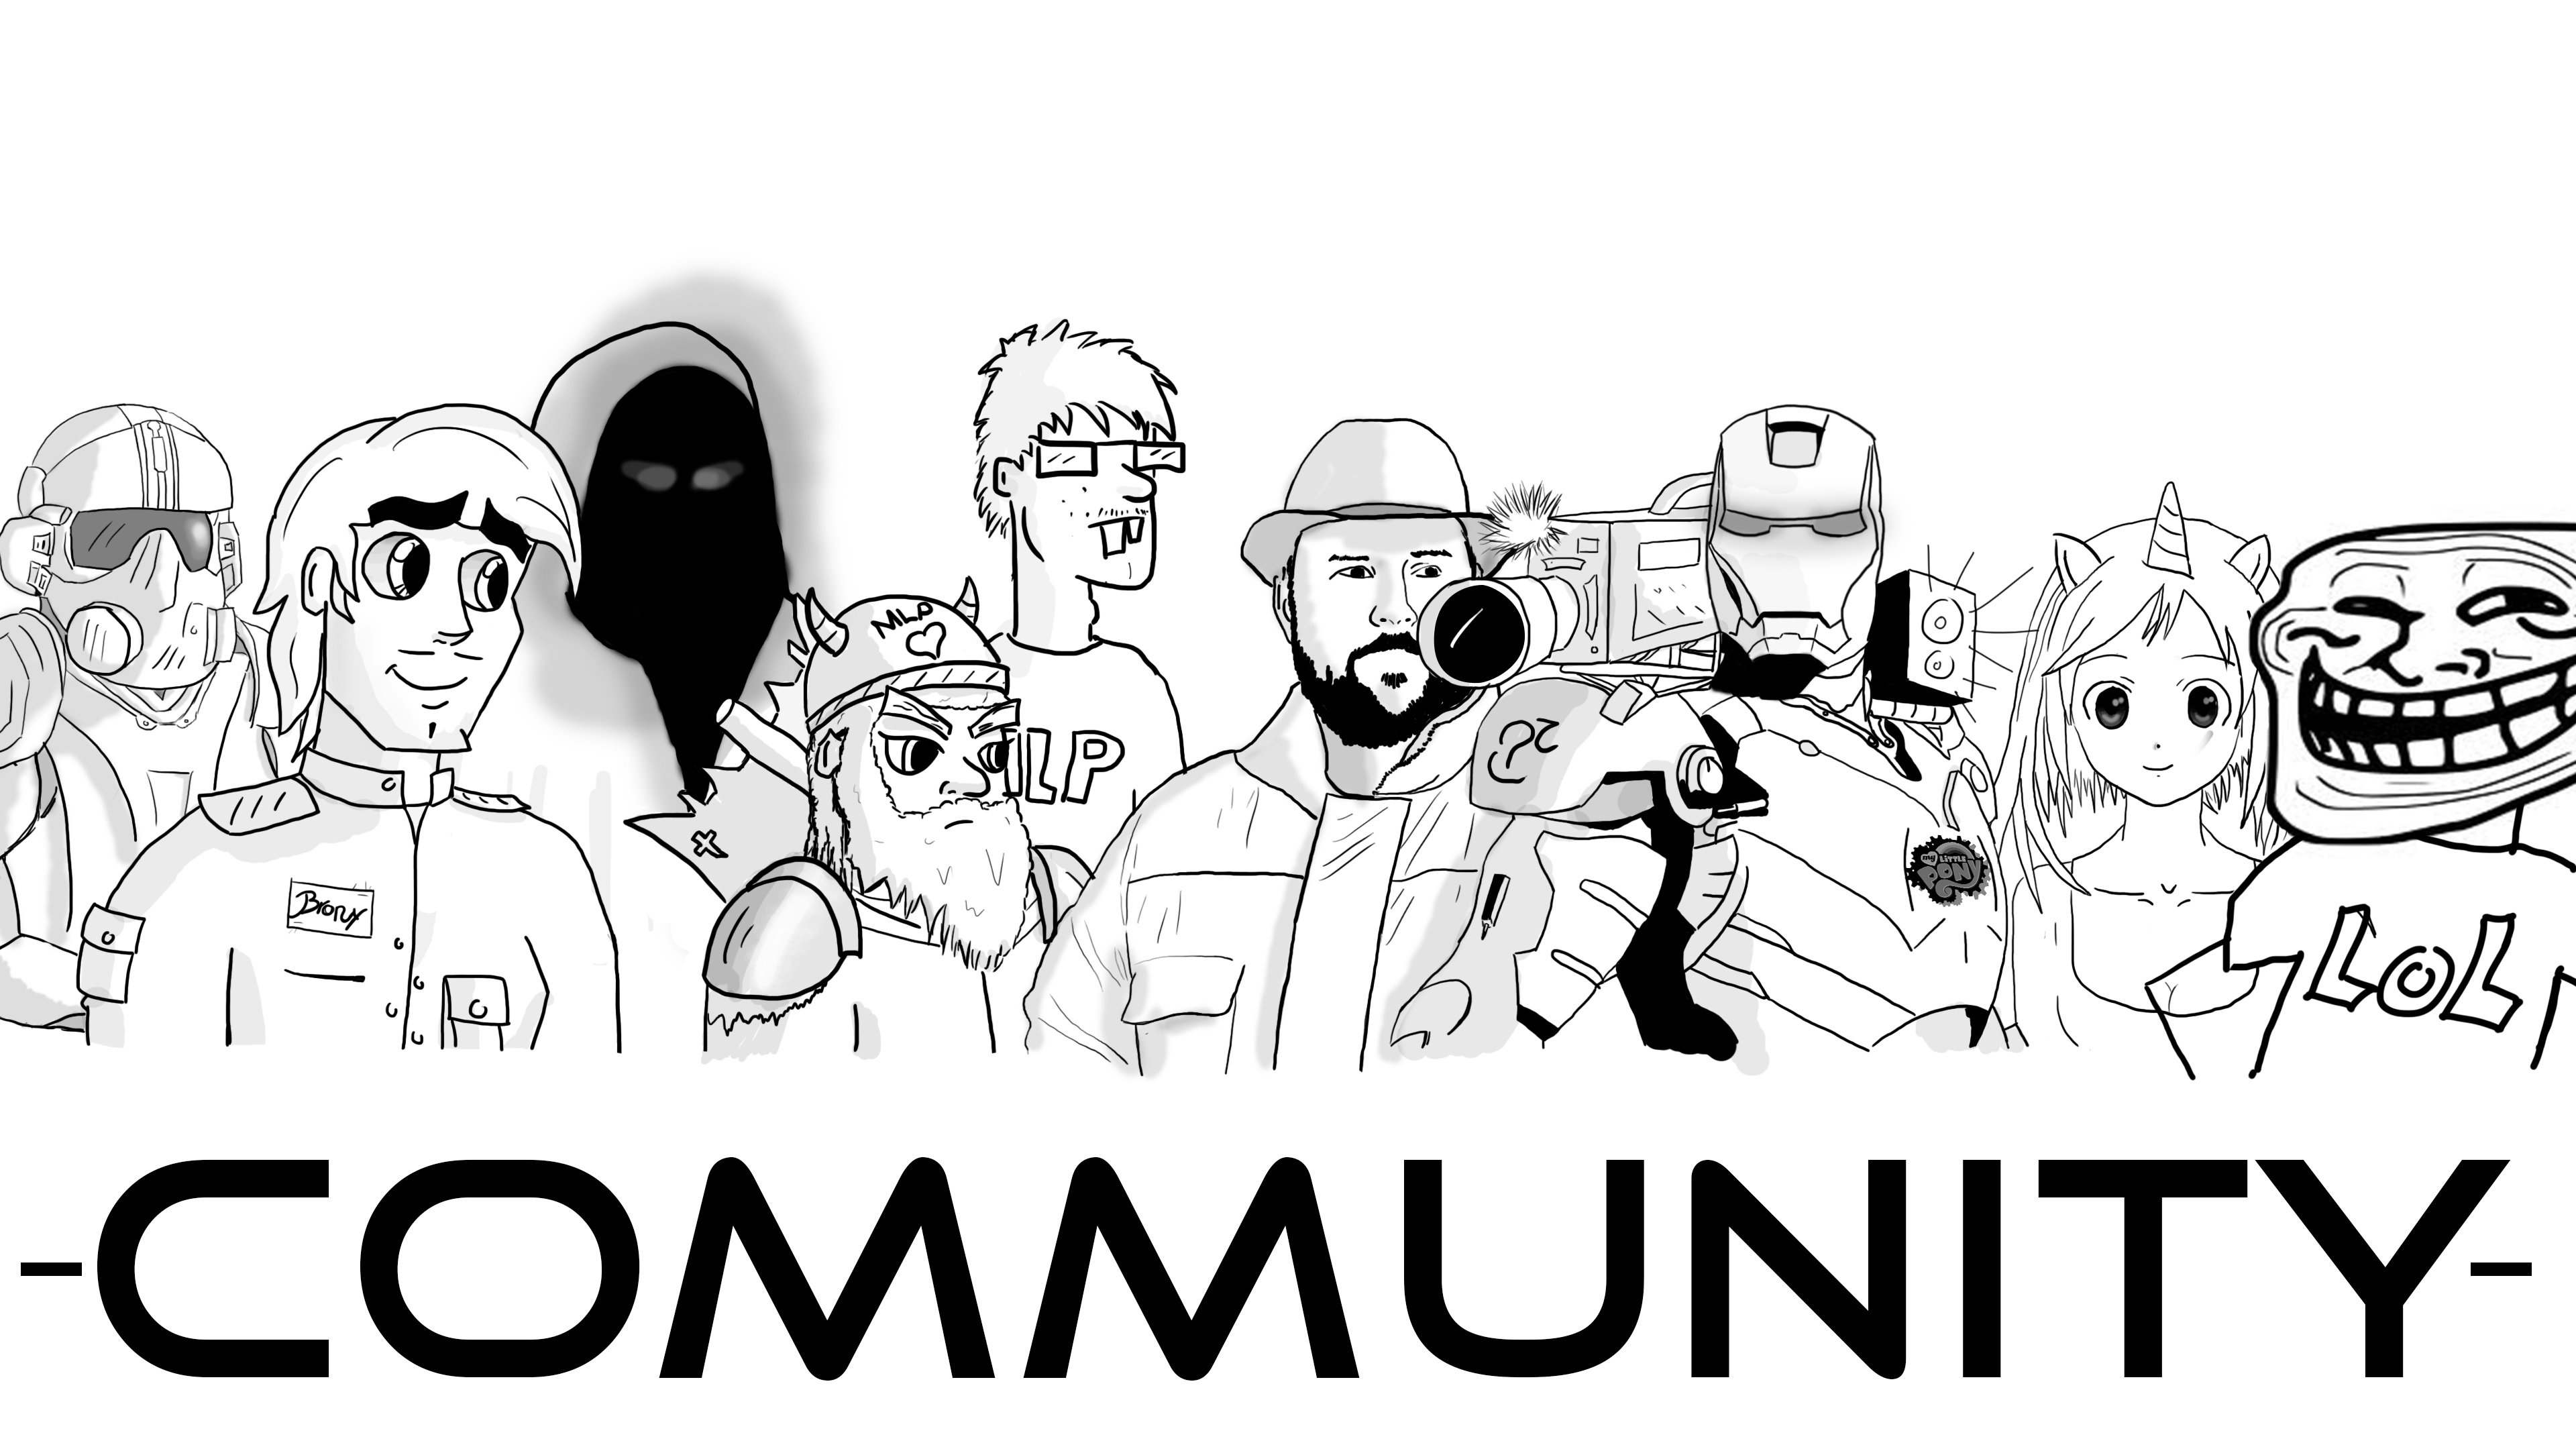 [Image: community_by_blackpegasuspics-d5y19kv.jpg]